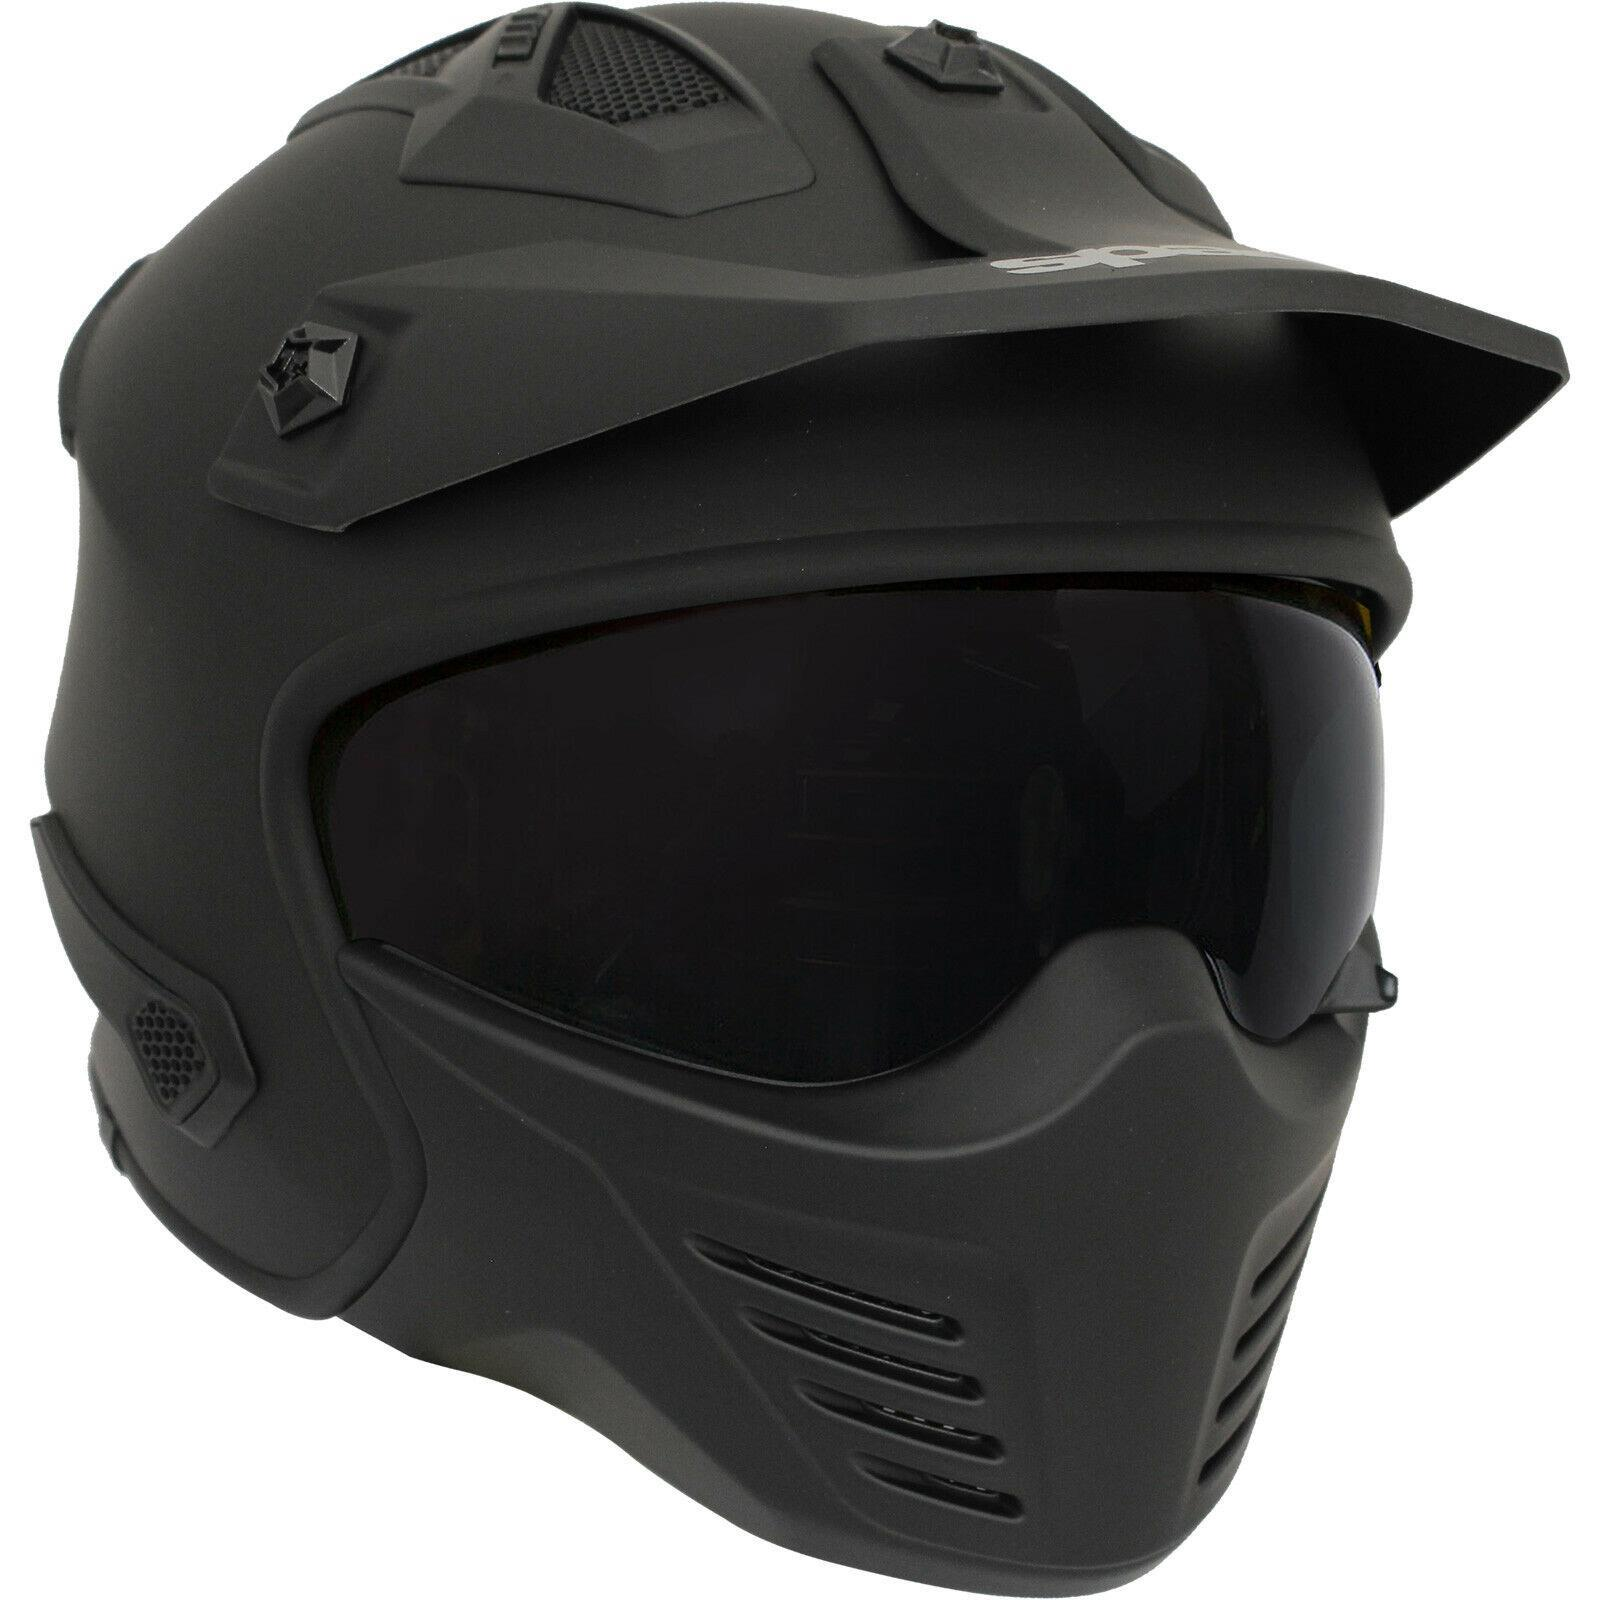 Spada-Storm-Plain-Open-Face-Motorcycle-Motorbike-Matt-Black-Sun-Visor-Helmet miniature 4